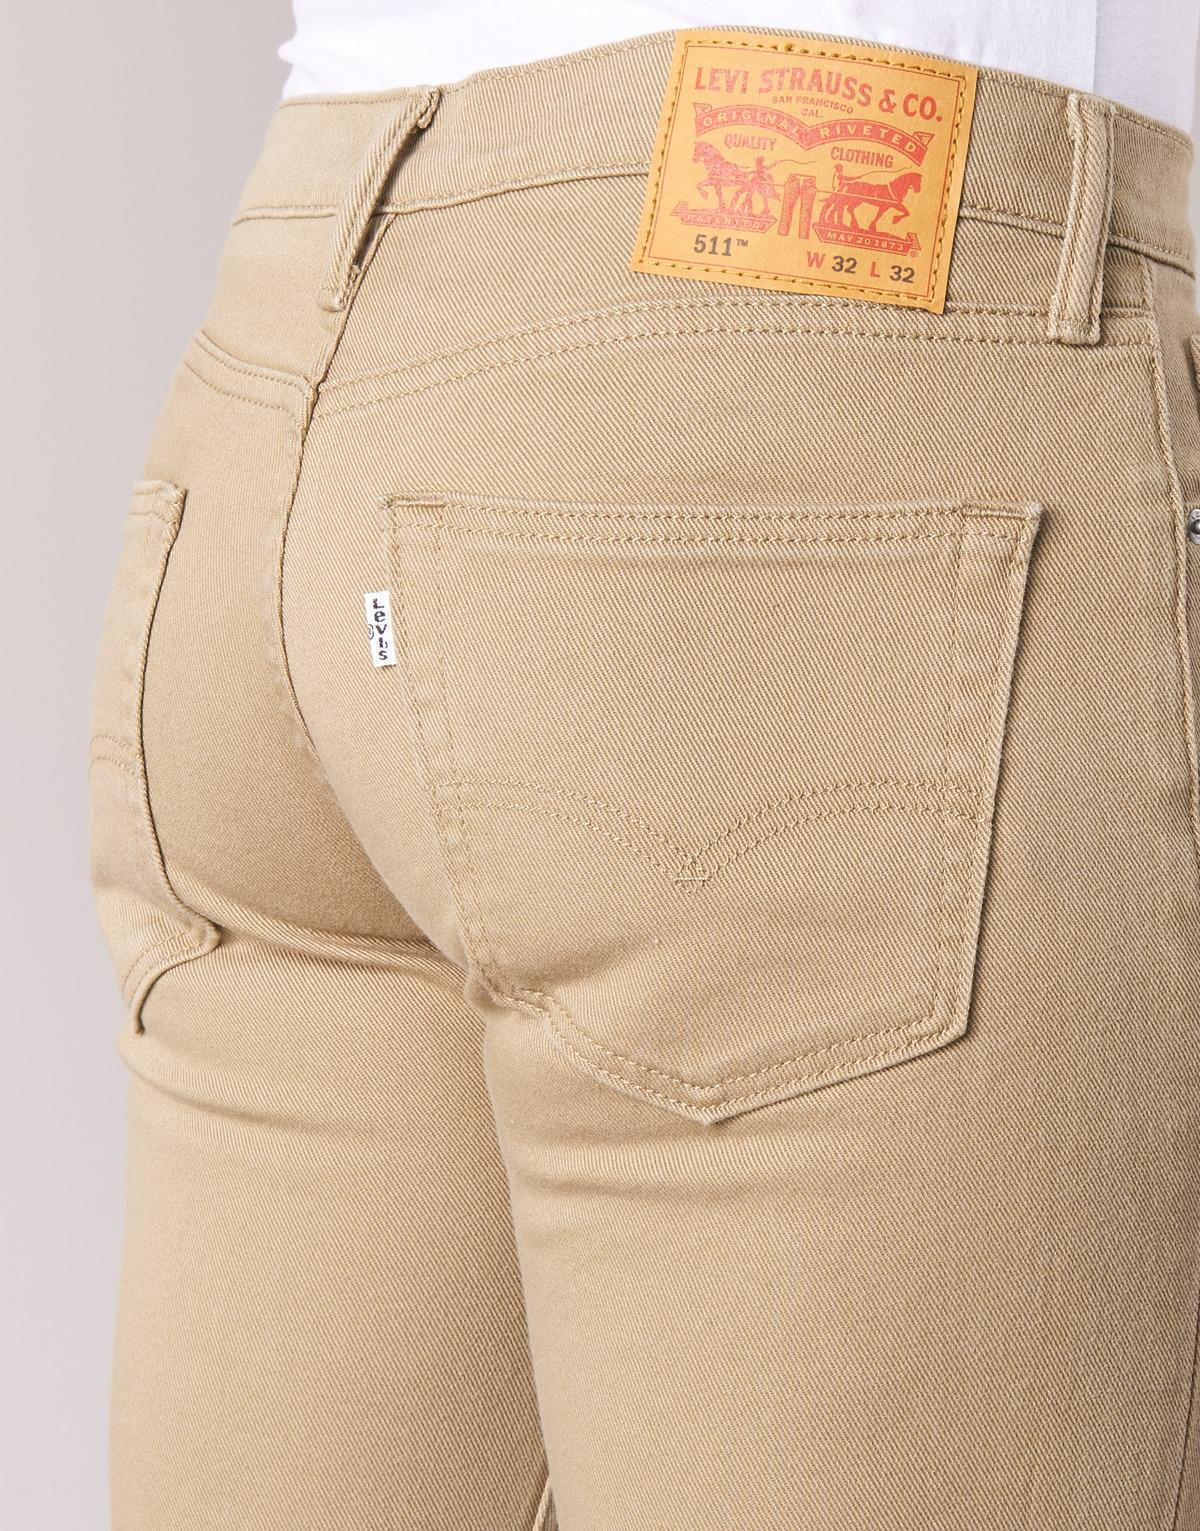 Mens Straight Leg Stretch Jeans